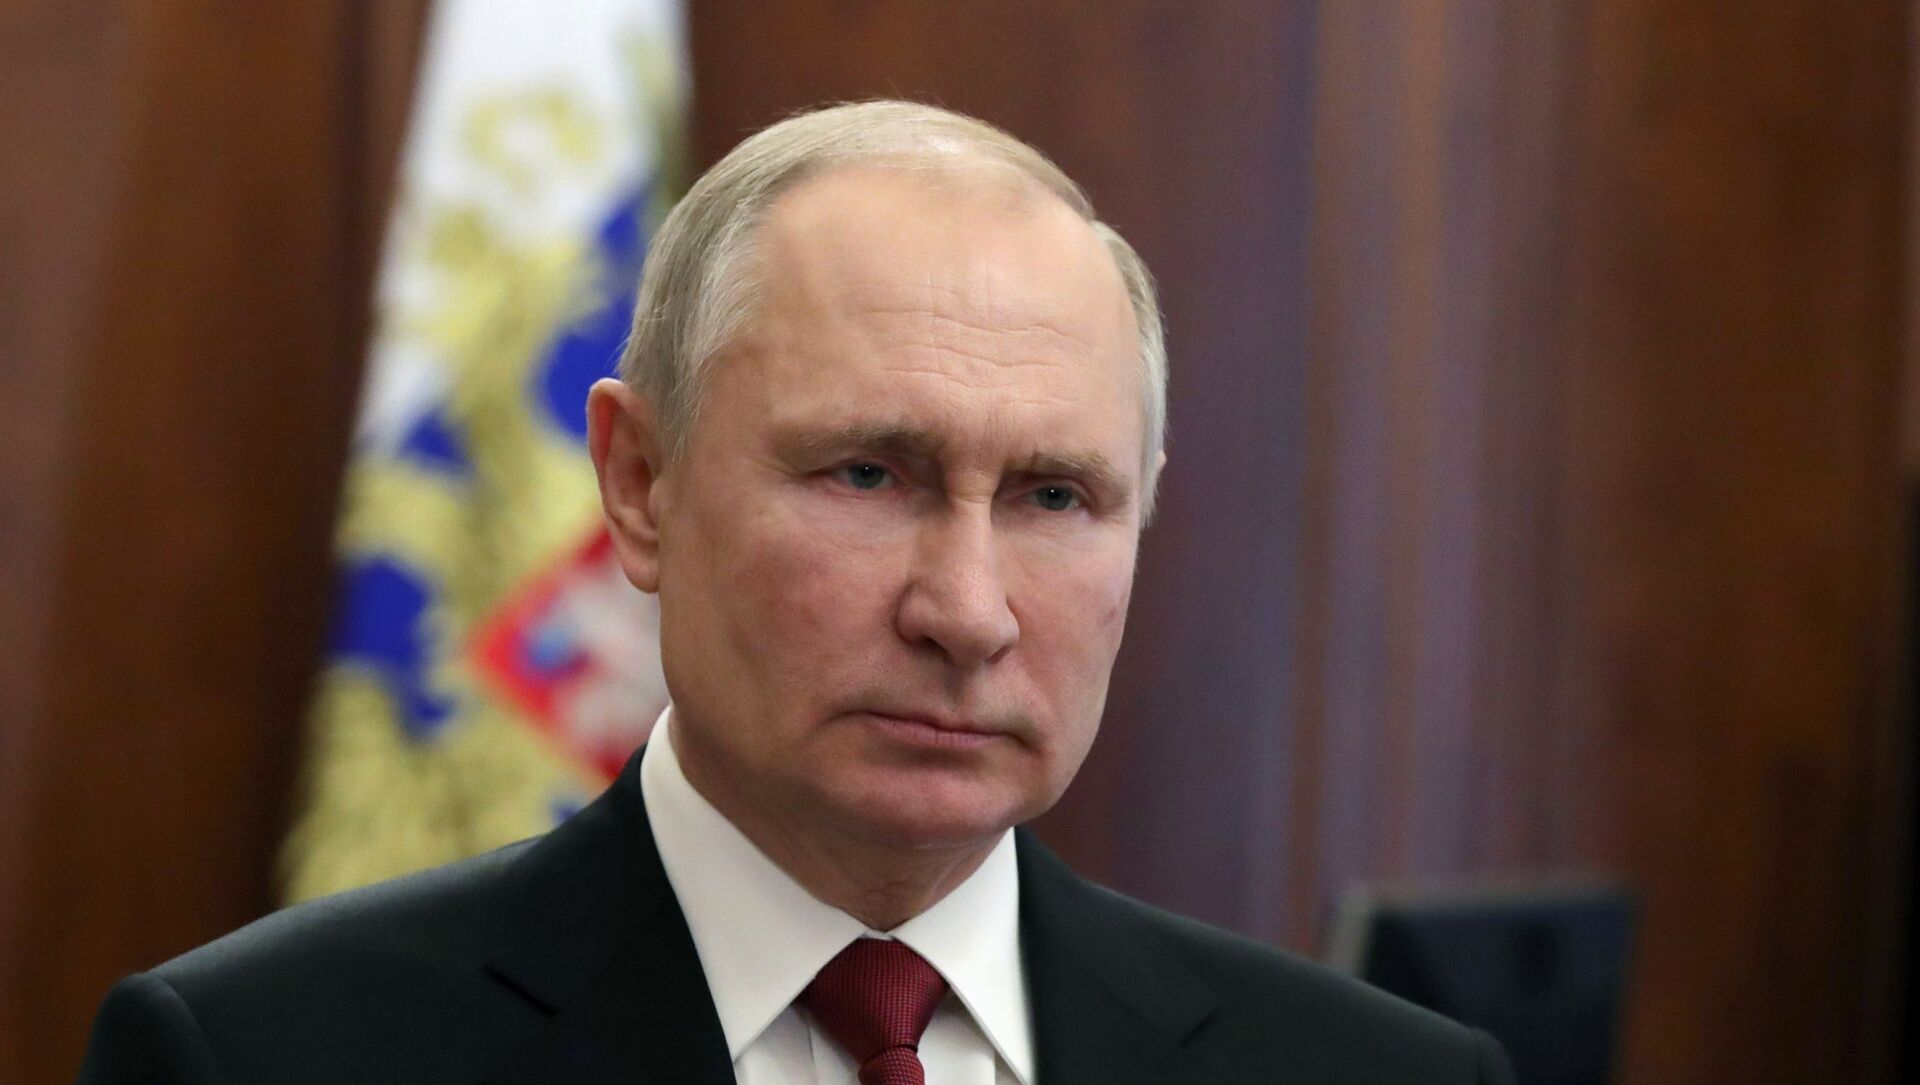 Prezydent Rosji Władimir Putin. - Sputnik Polska, 1920, 22.04.2021